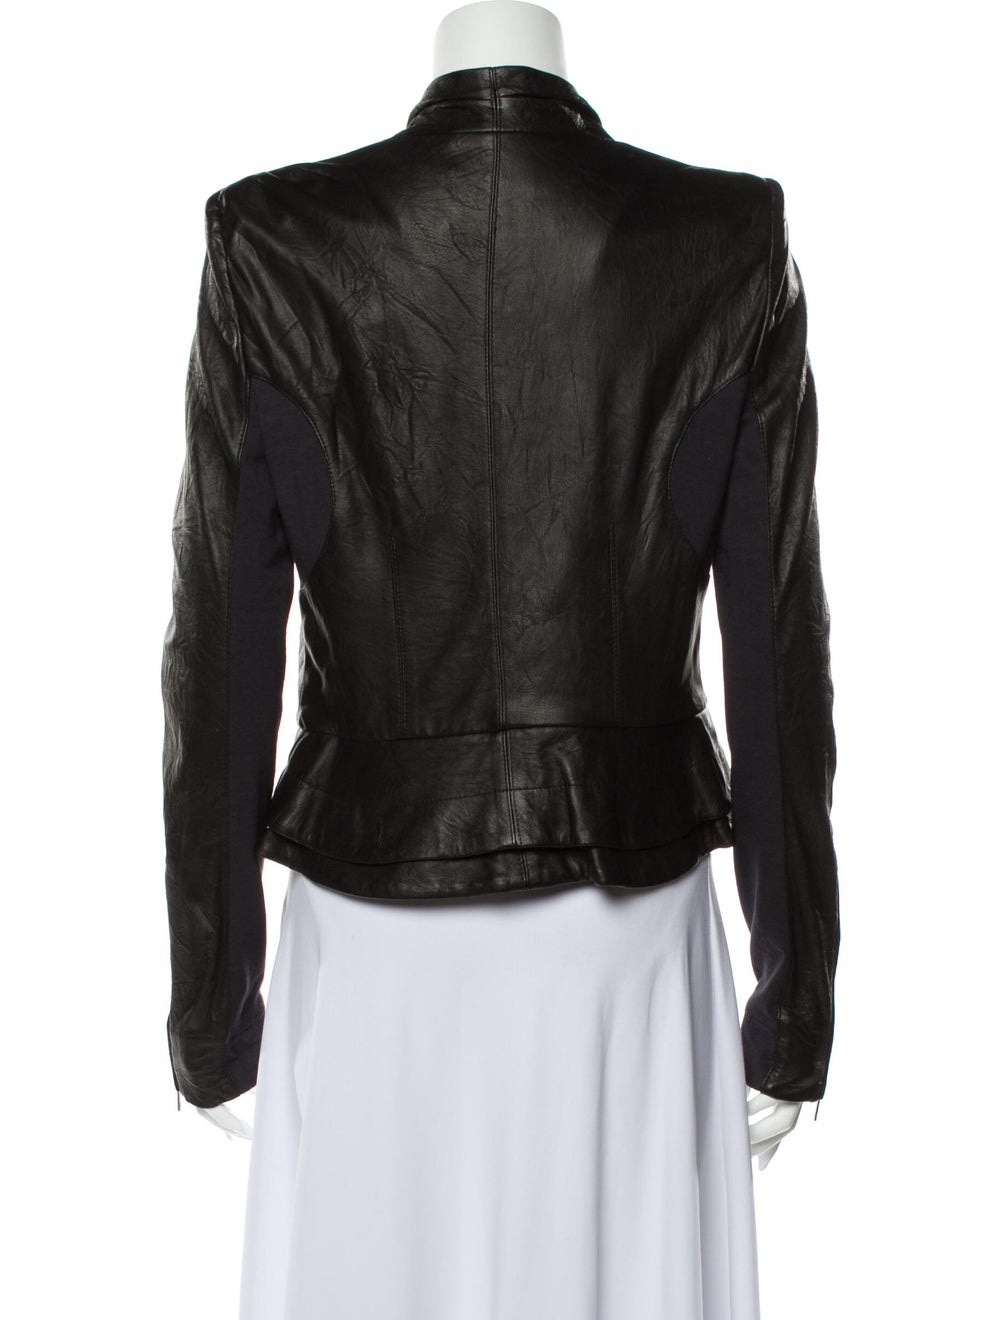 A.l.c. Leather Blazer Black - image 3